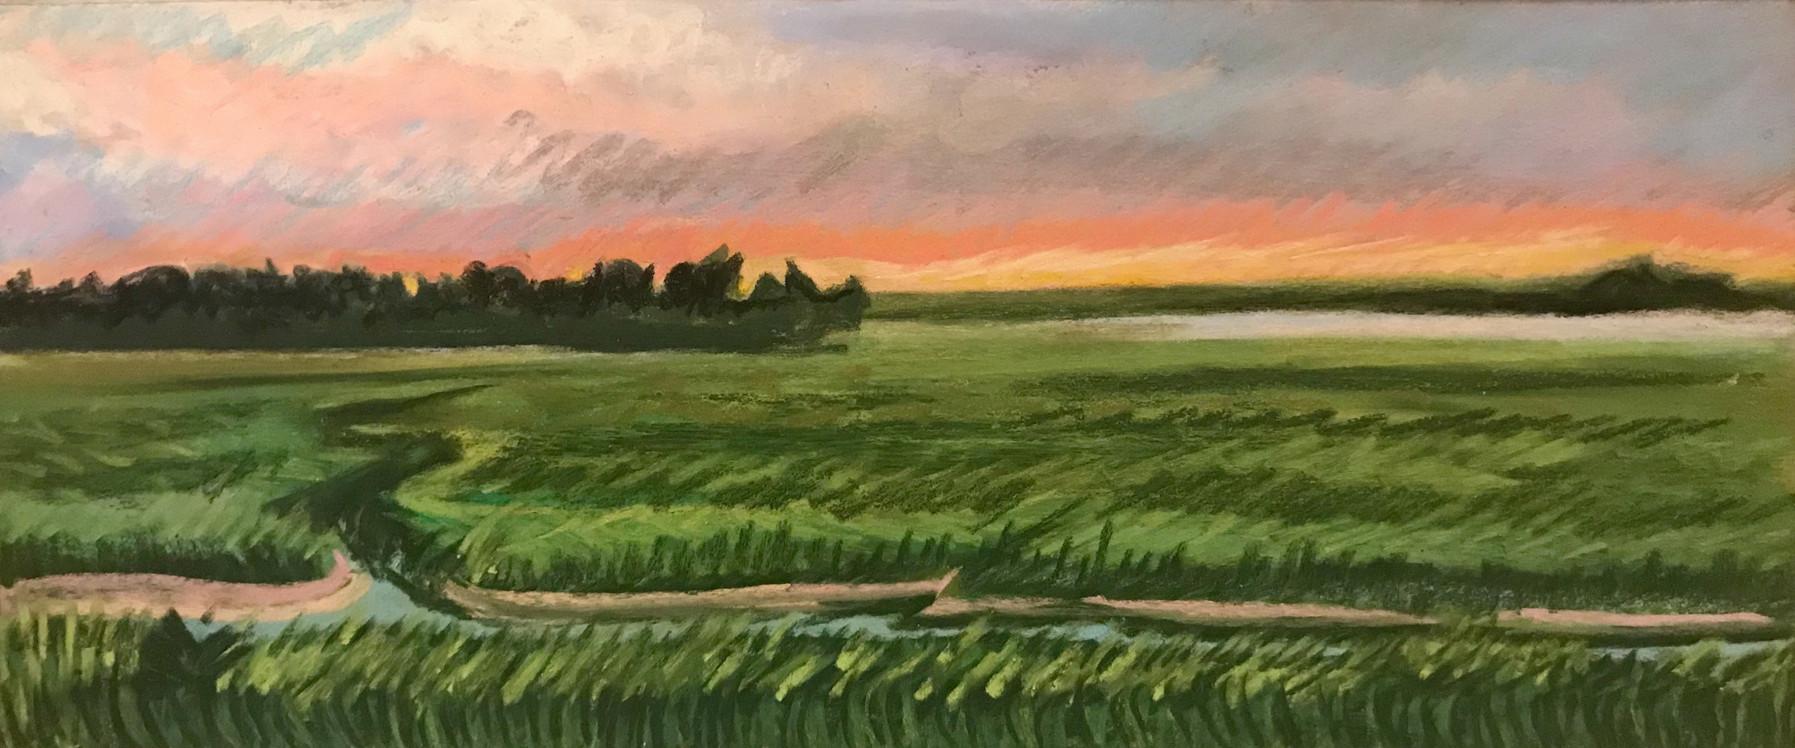 Seabrook Sunset